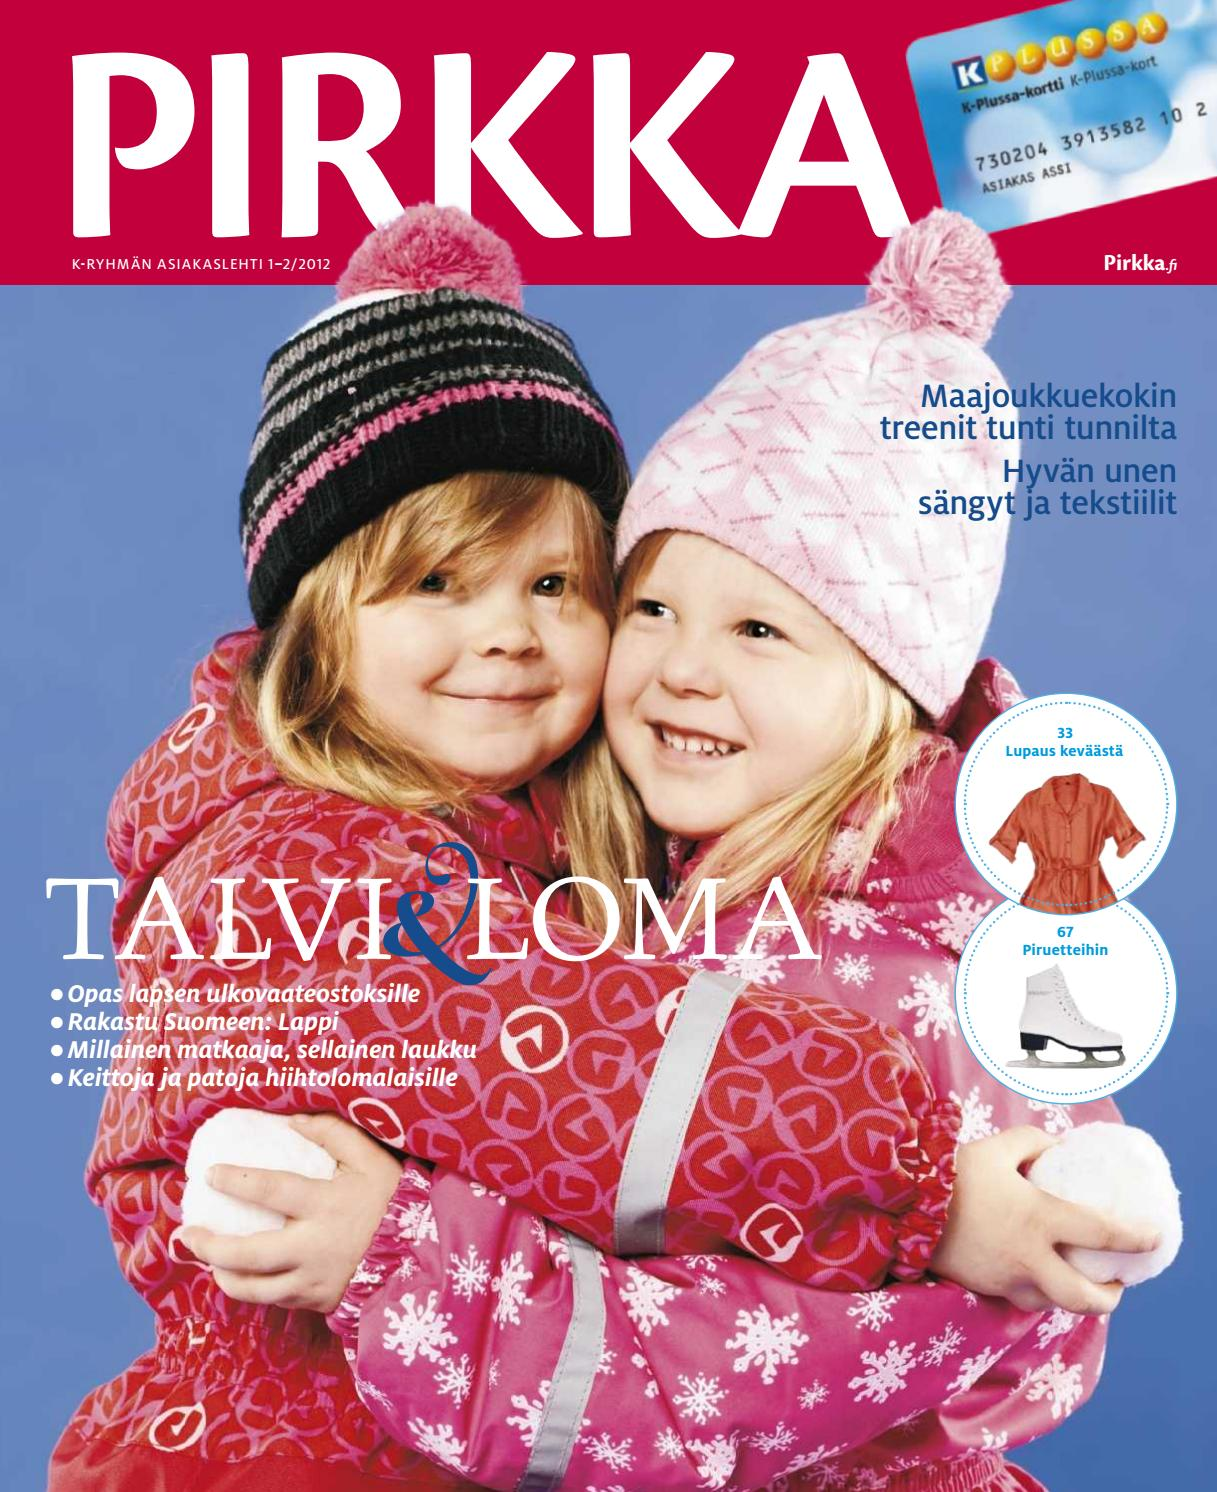 PIRKKA 1-2 2012 by Ruokakesko - issuu 3d32f72f34